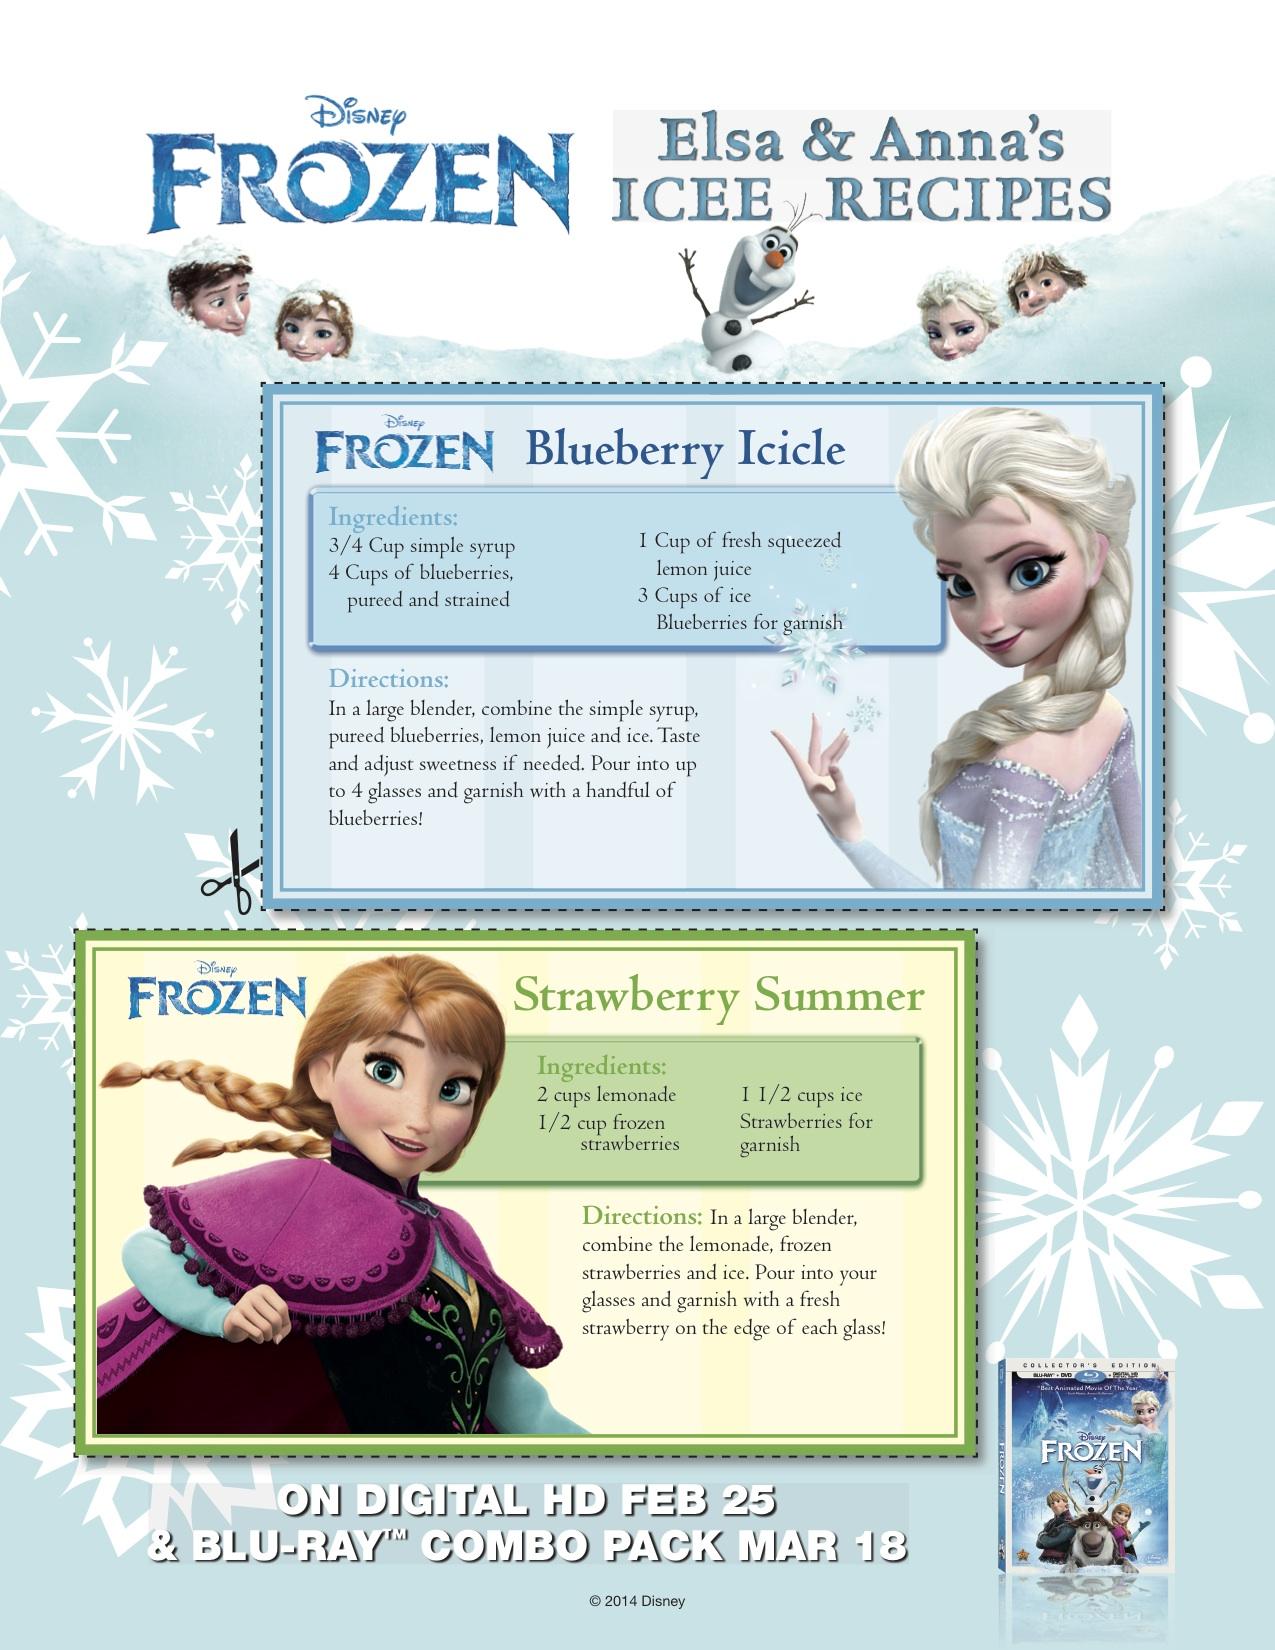 Frozen - Elsa and Anna's Icee Recipe